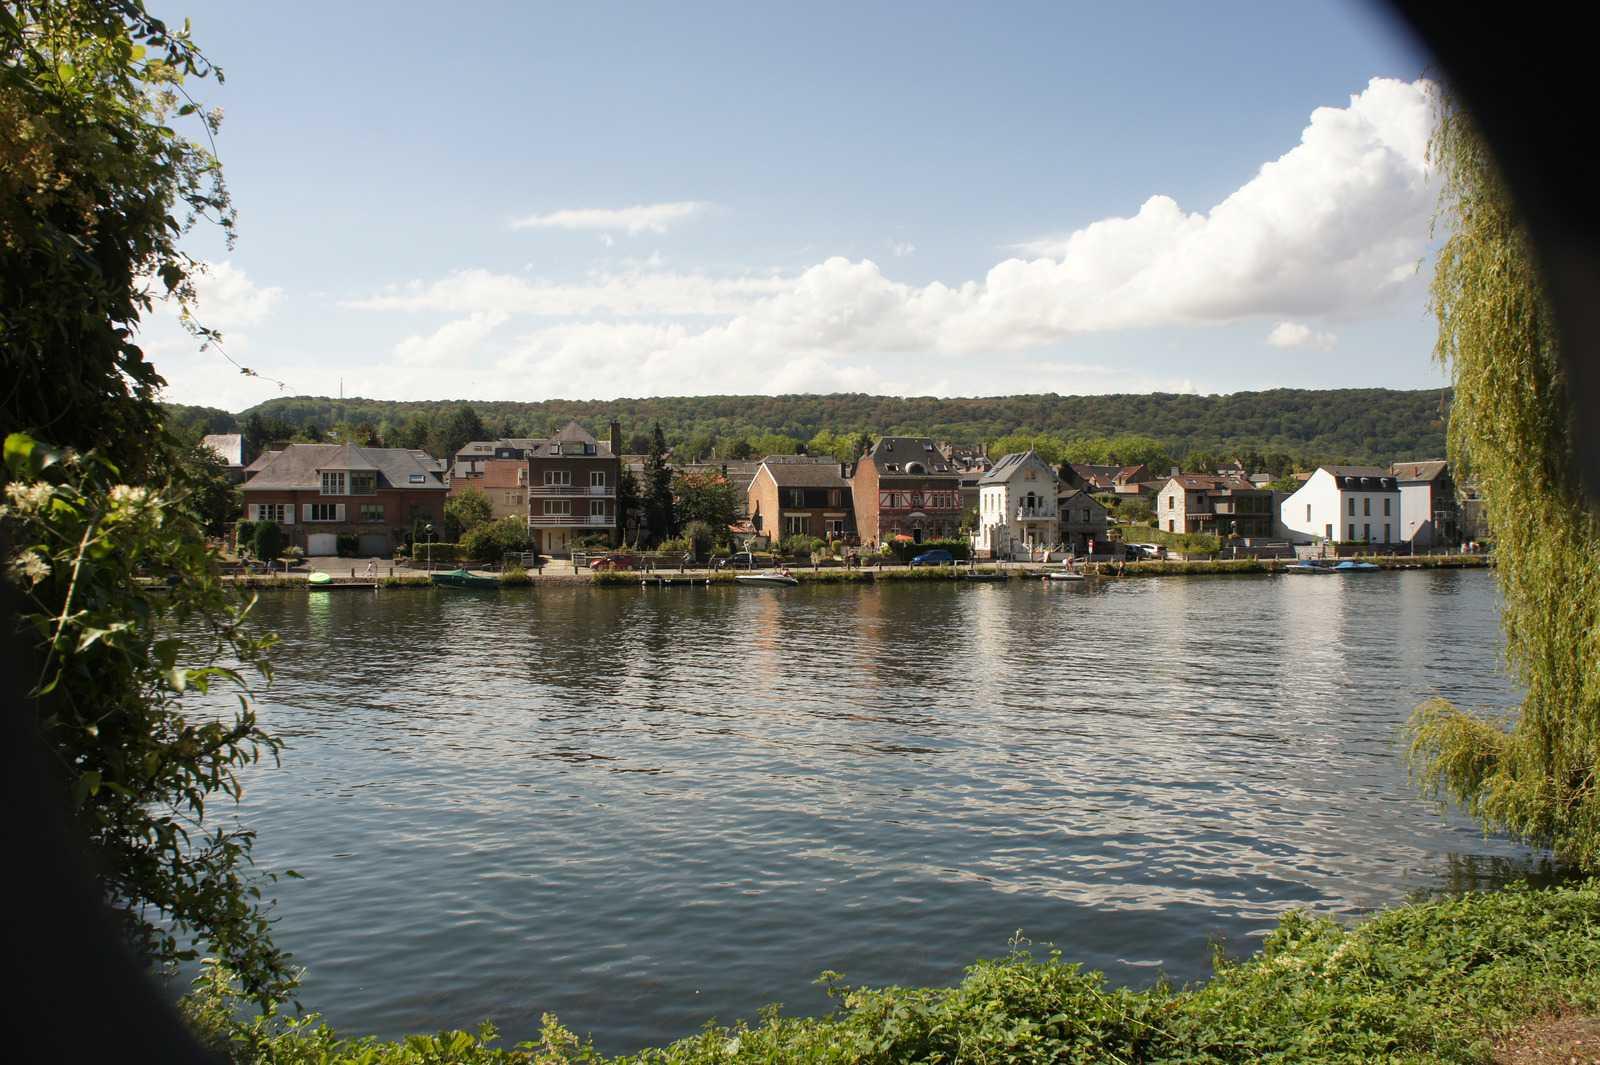 The Meuse river, Namur, Belgium.